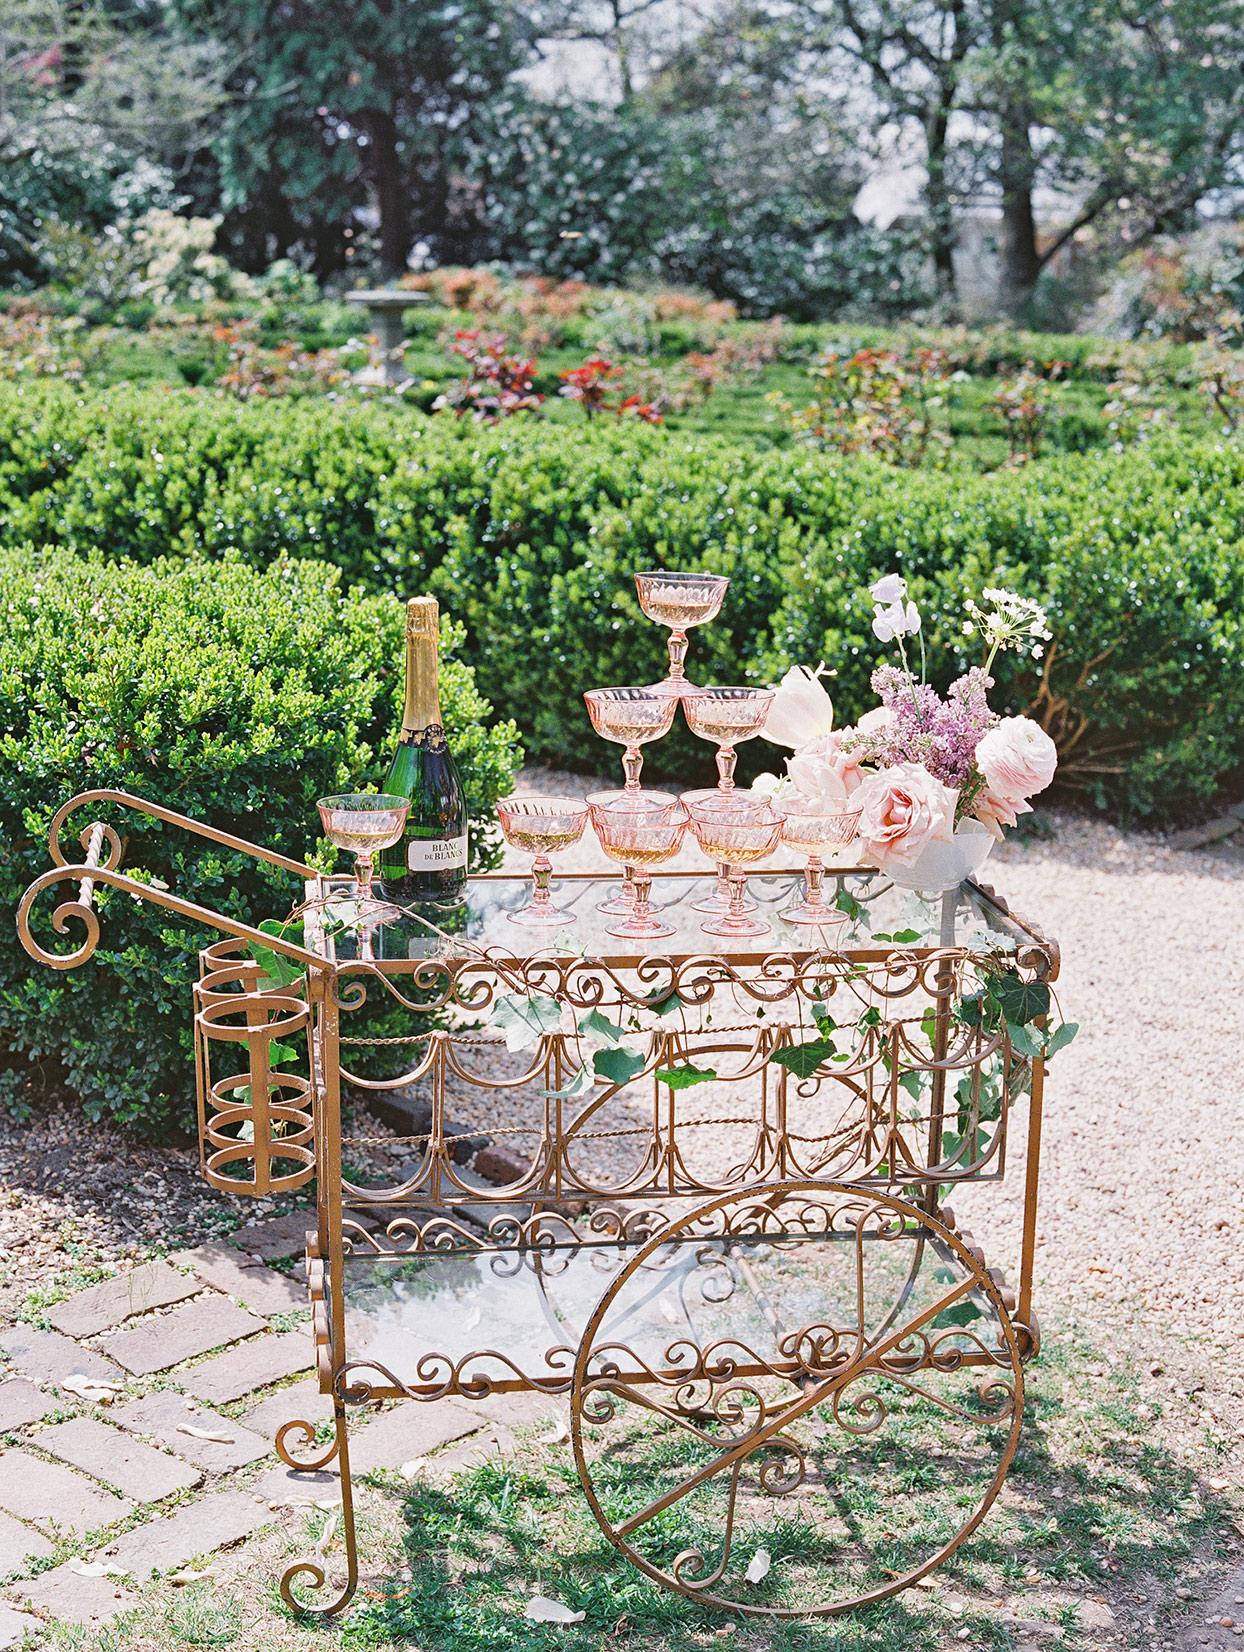 champagne wedding ideas old-fashioned decorative cart